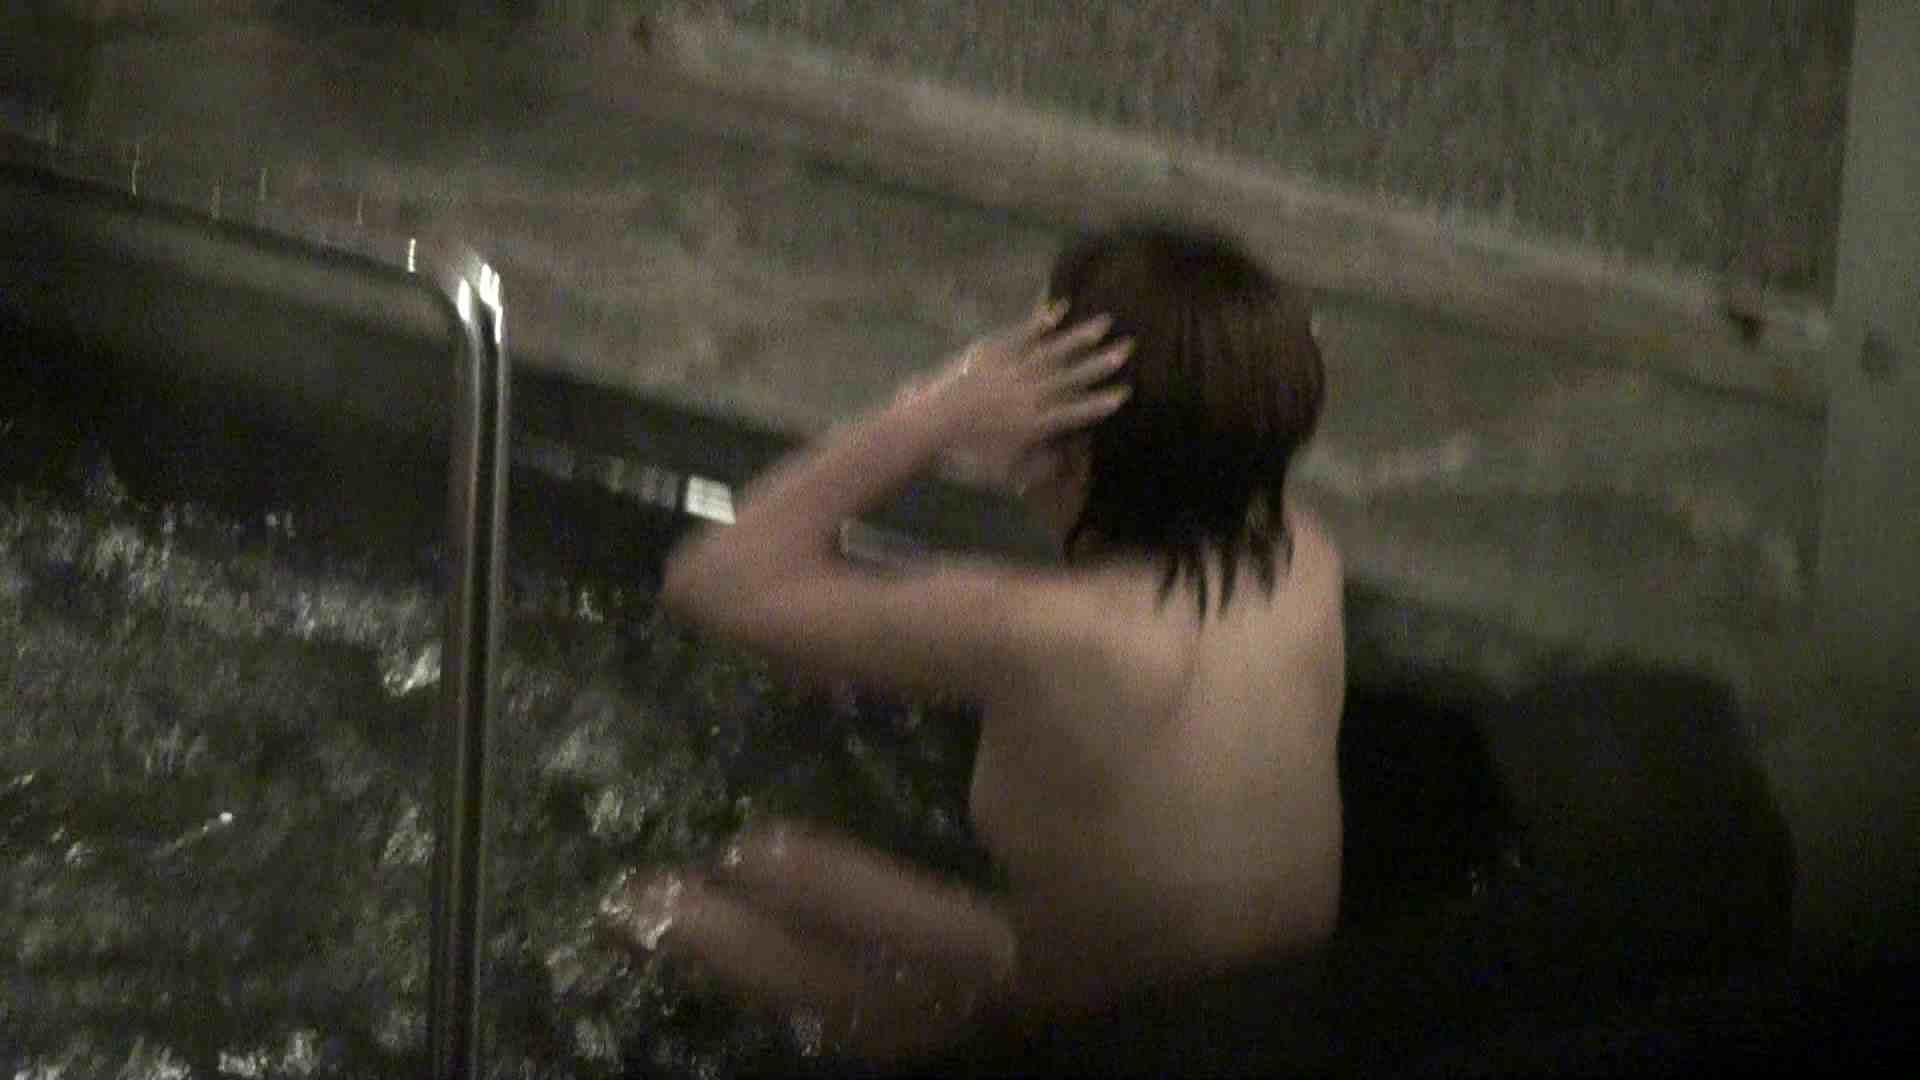 Aquaな露天風呂Vol.411 盗撮 | HなOL  49pic 45